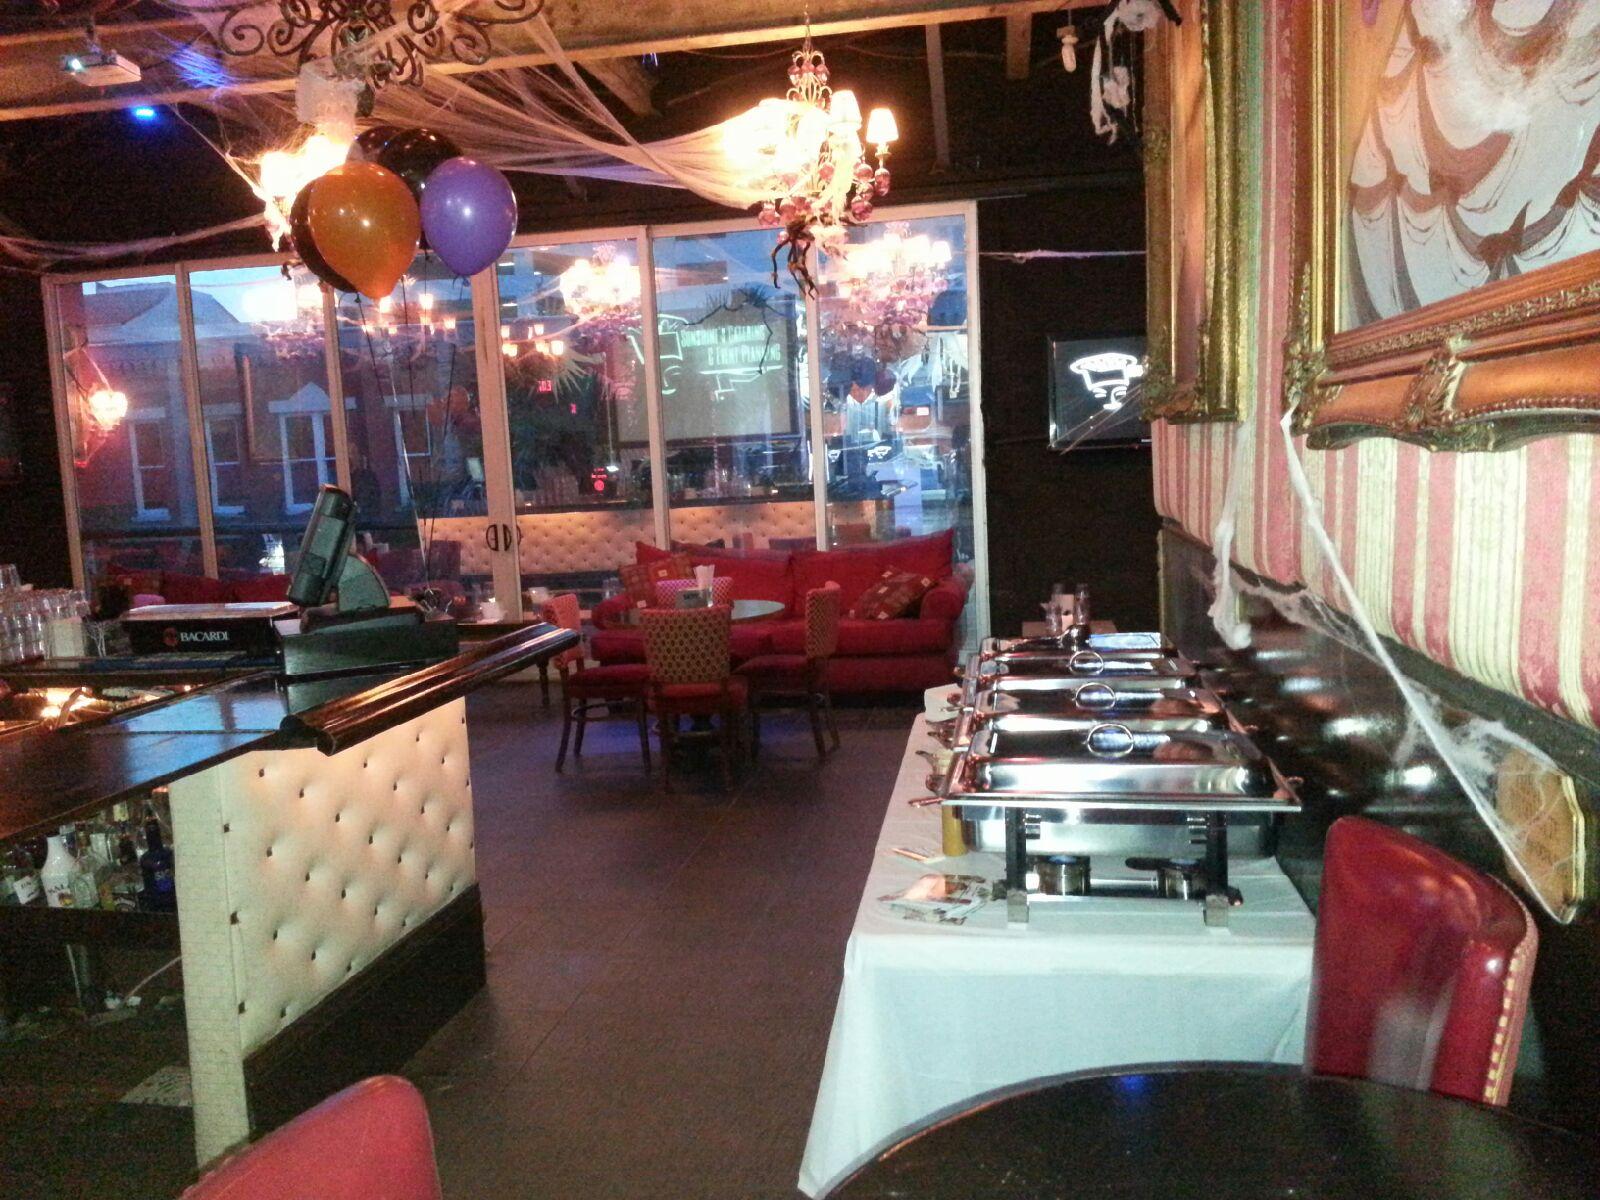 Monarchy Nightclub Catering West Palm Beach, FL